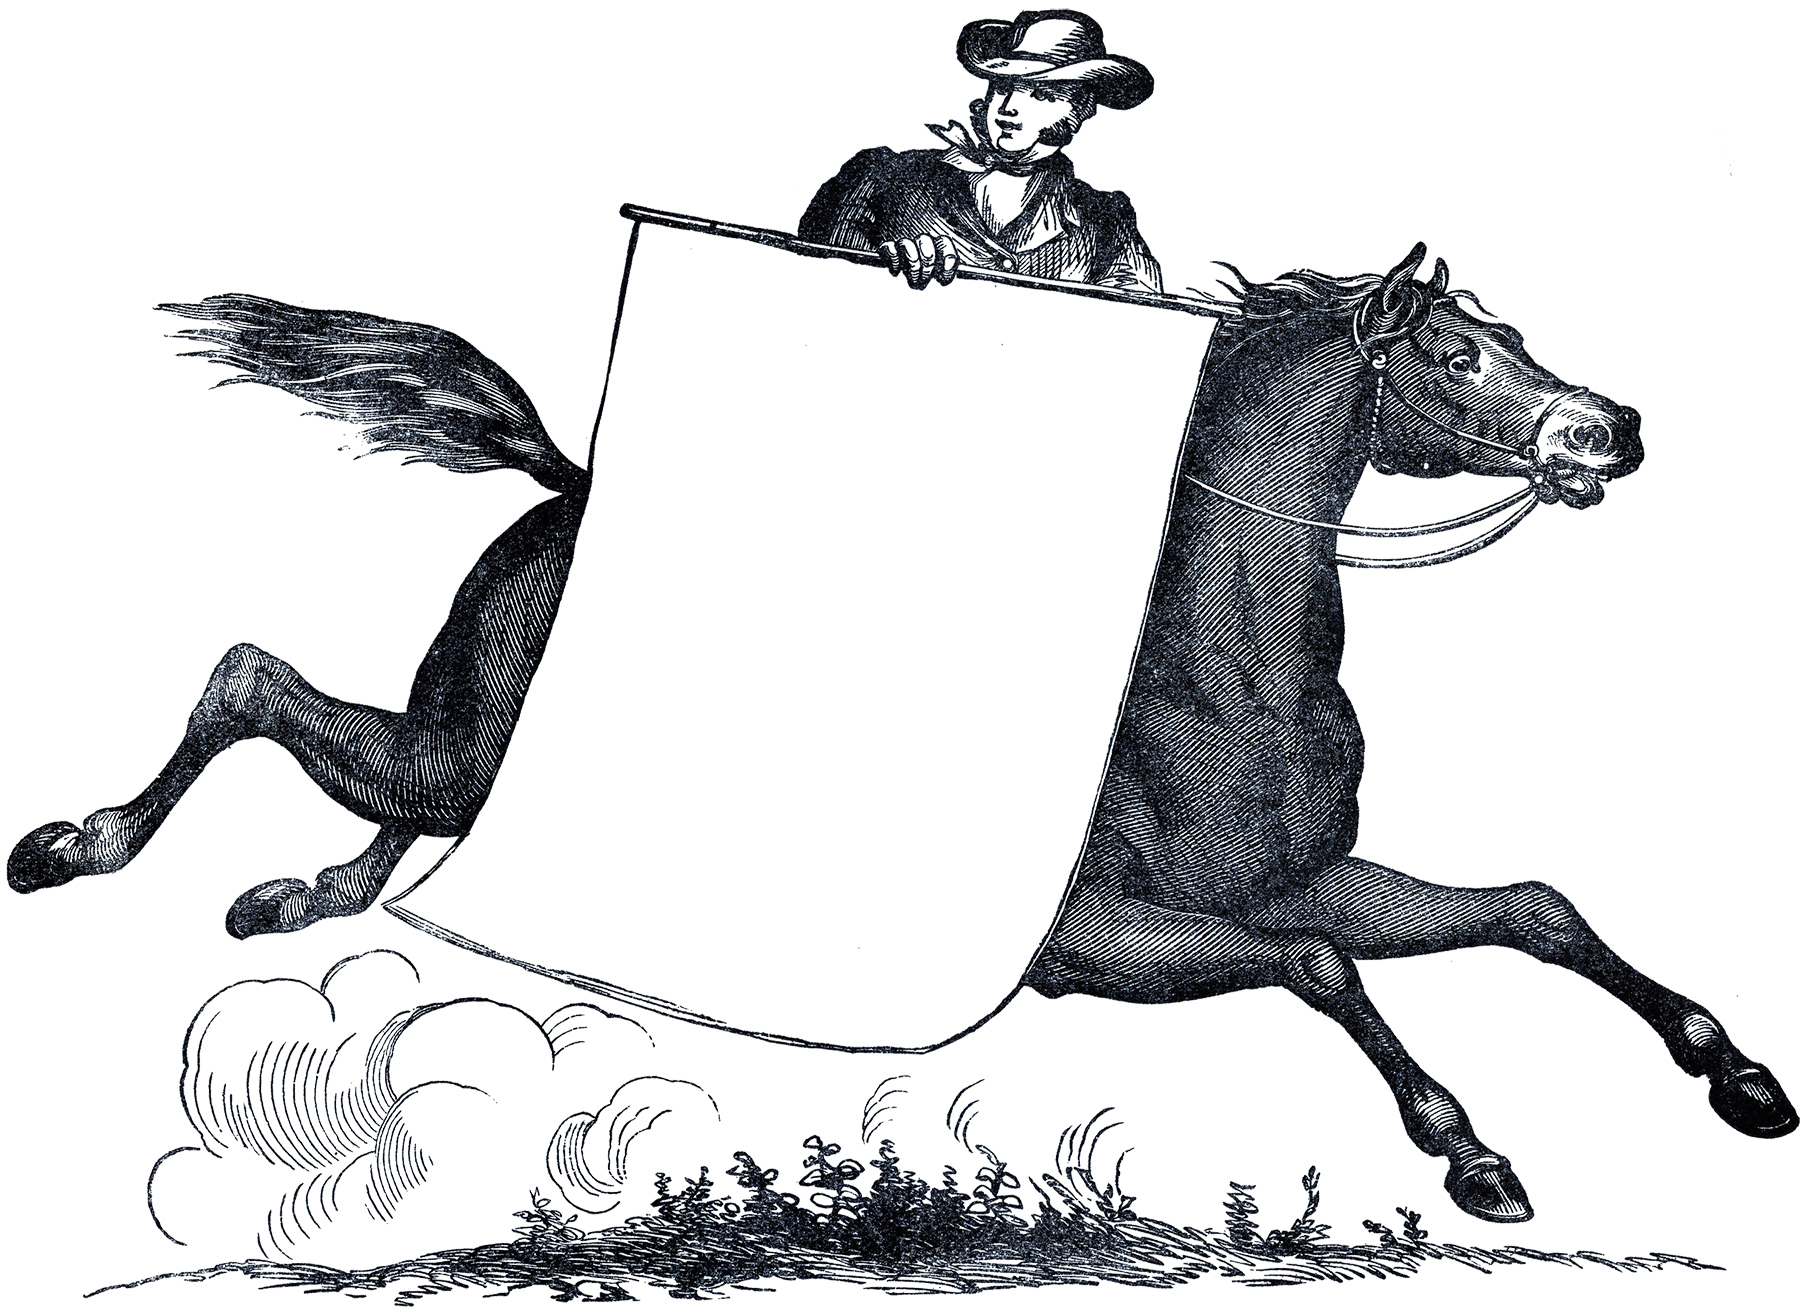 Amusing Antique Horse and Rider Label Image! - The ...